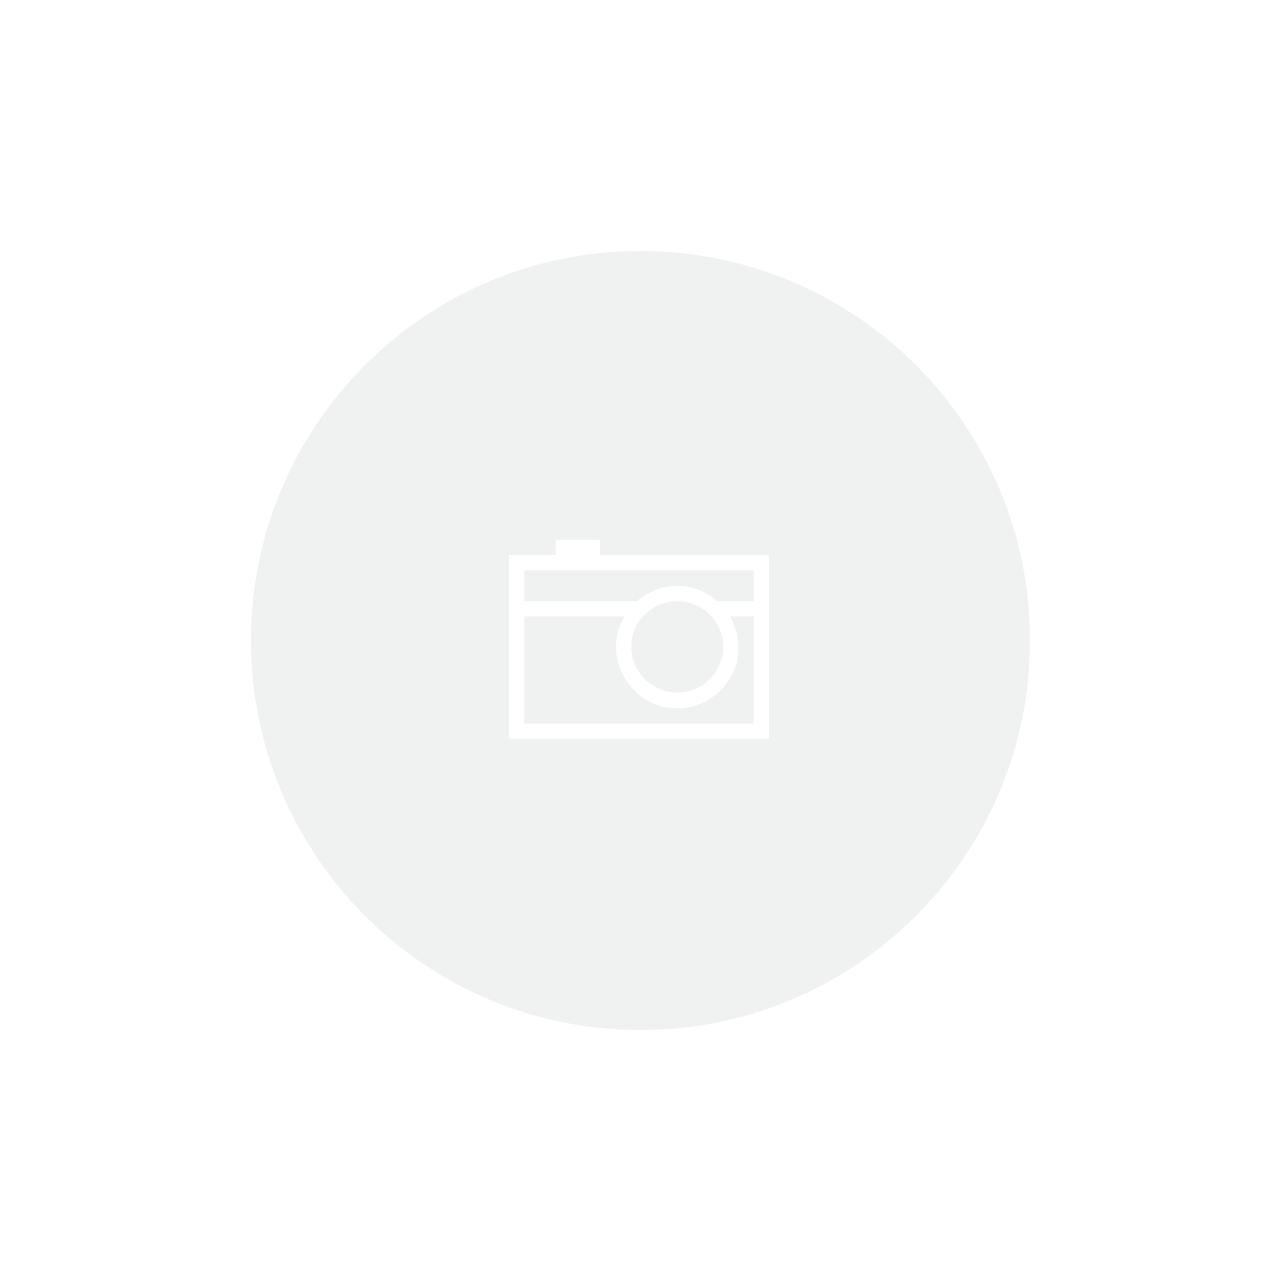 Ref 3531 - Peep toe clássico amoreco